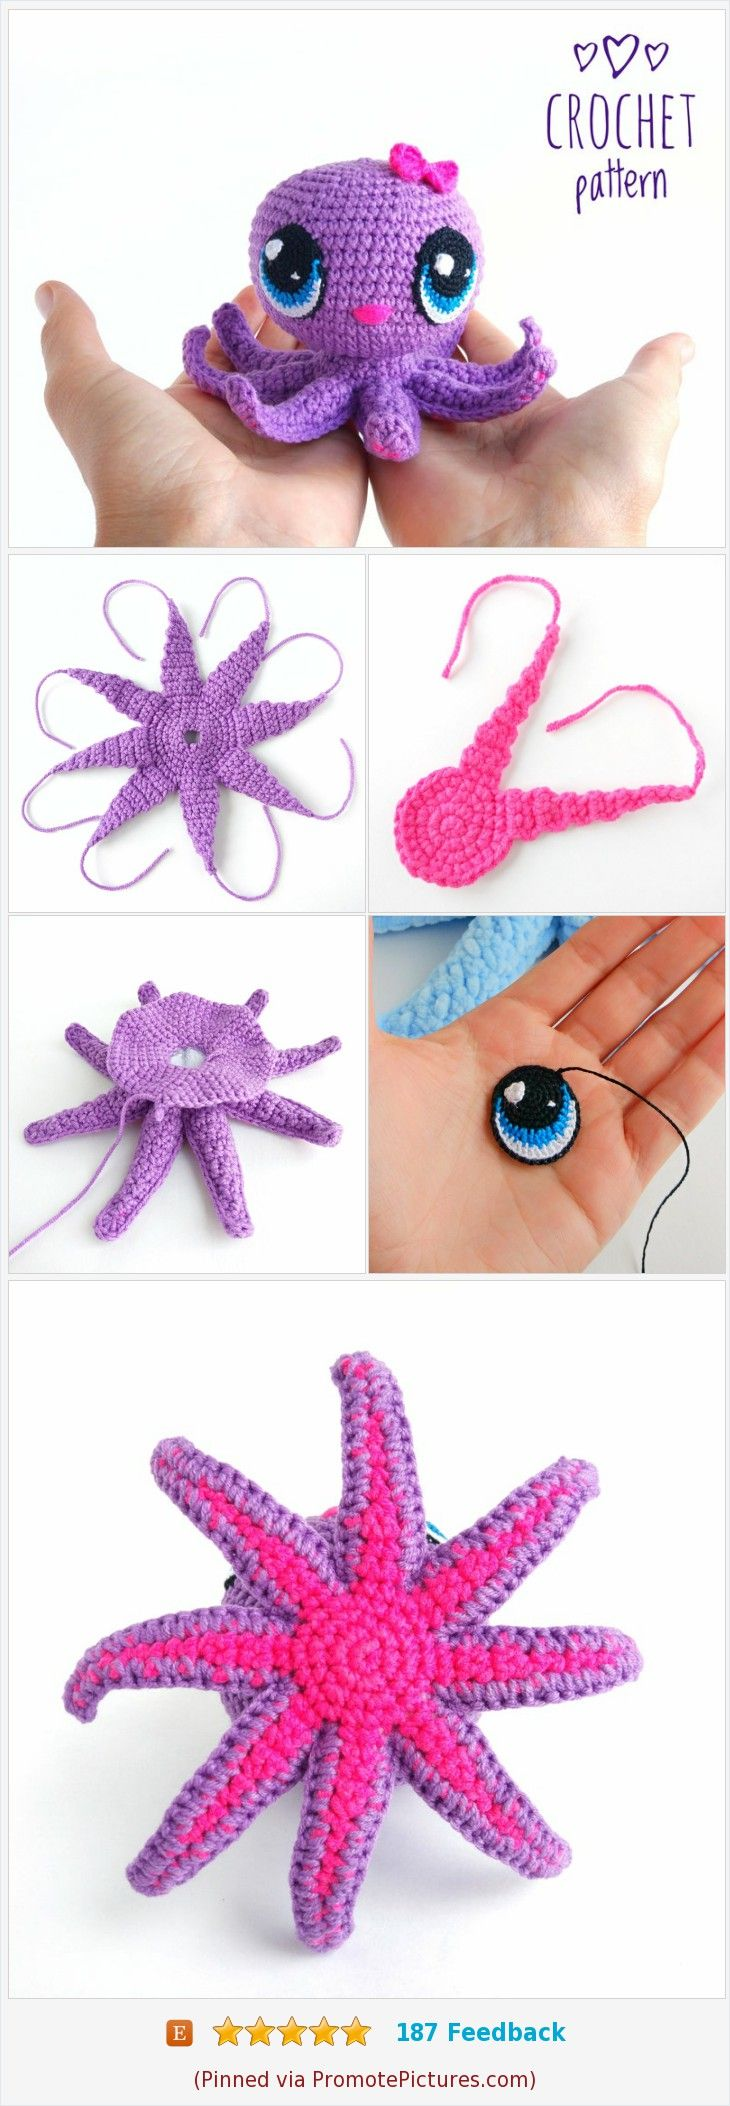 Happyamigurumi: Amigurumi Free Seamless Octopus Pattern - DIY ... | 2106x730